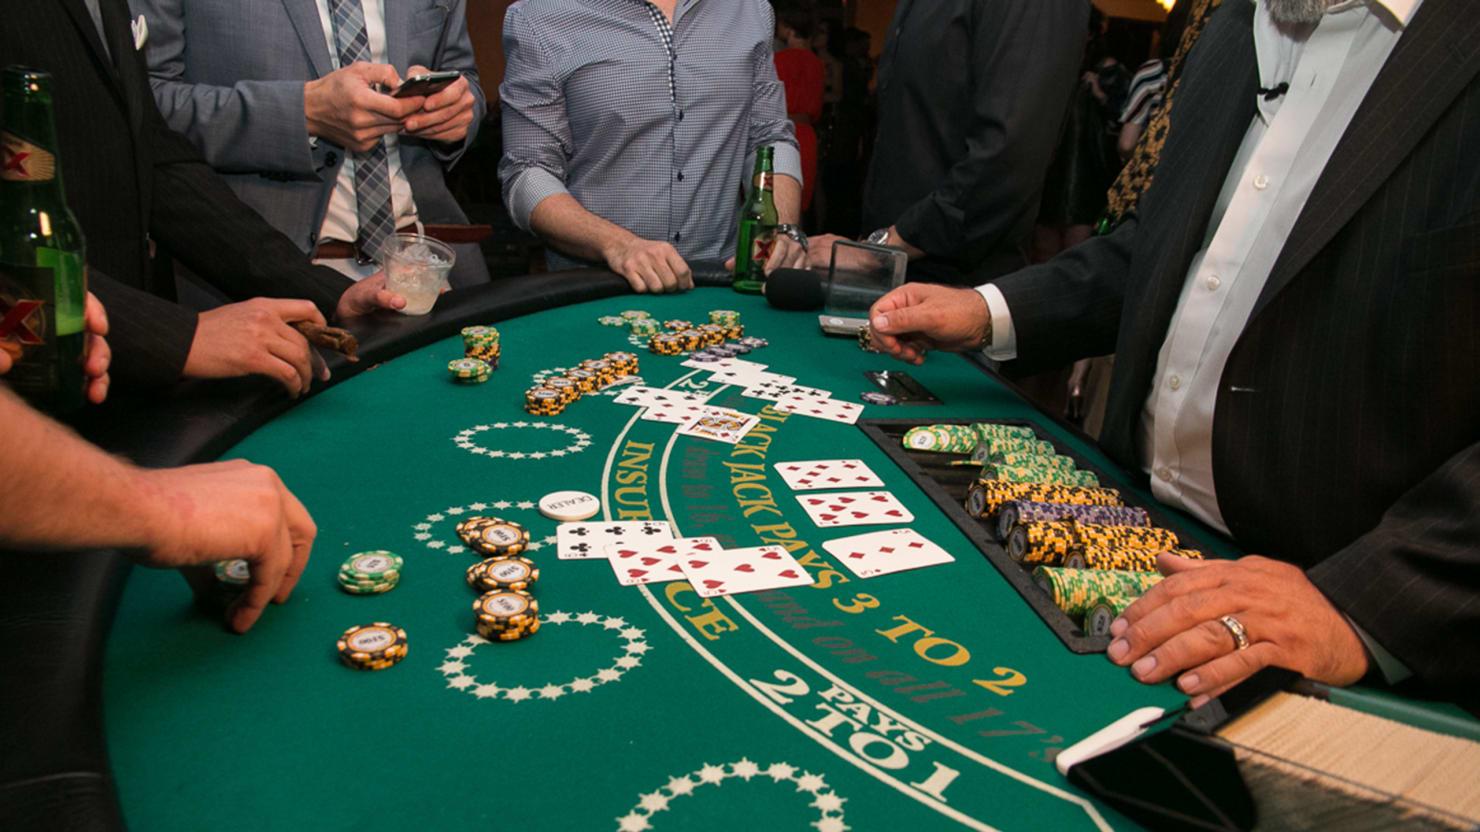 Blackjack counting cards priset